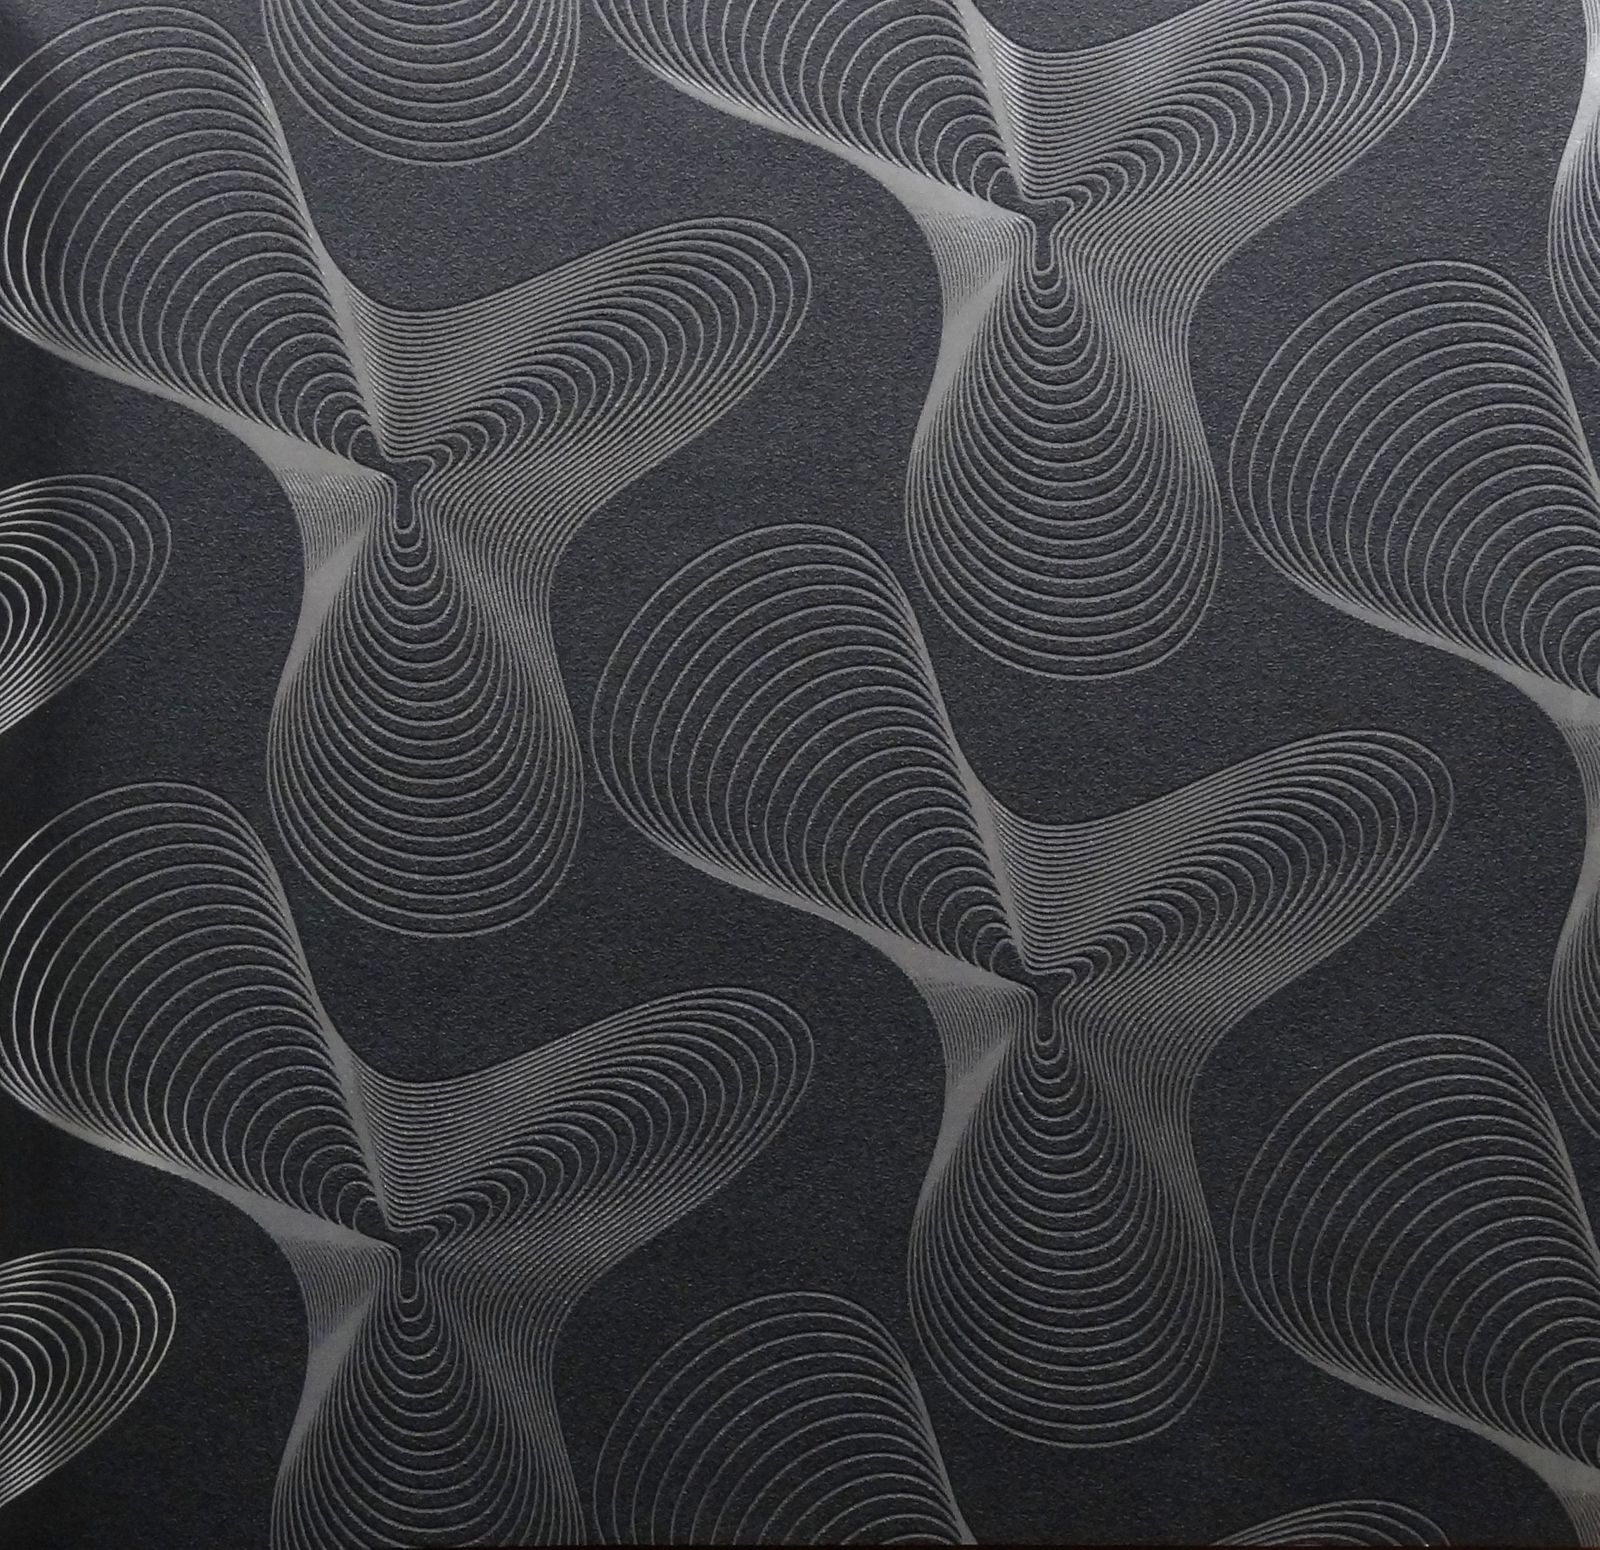 marburg designtapete karim rashid tapete 52017 silber schwarz. Black Bedroom Furniture Sets. Home Design Ideas